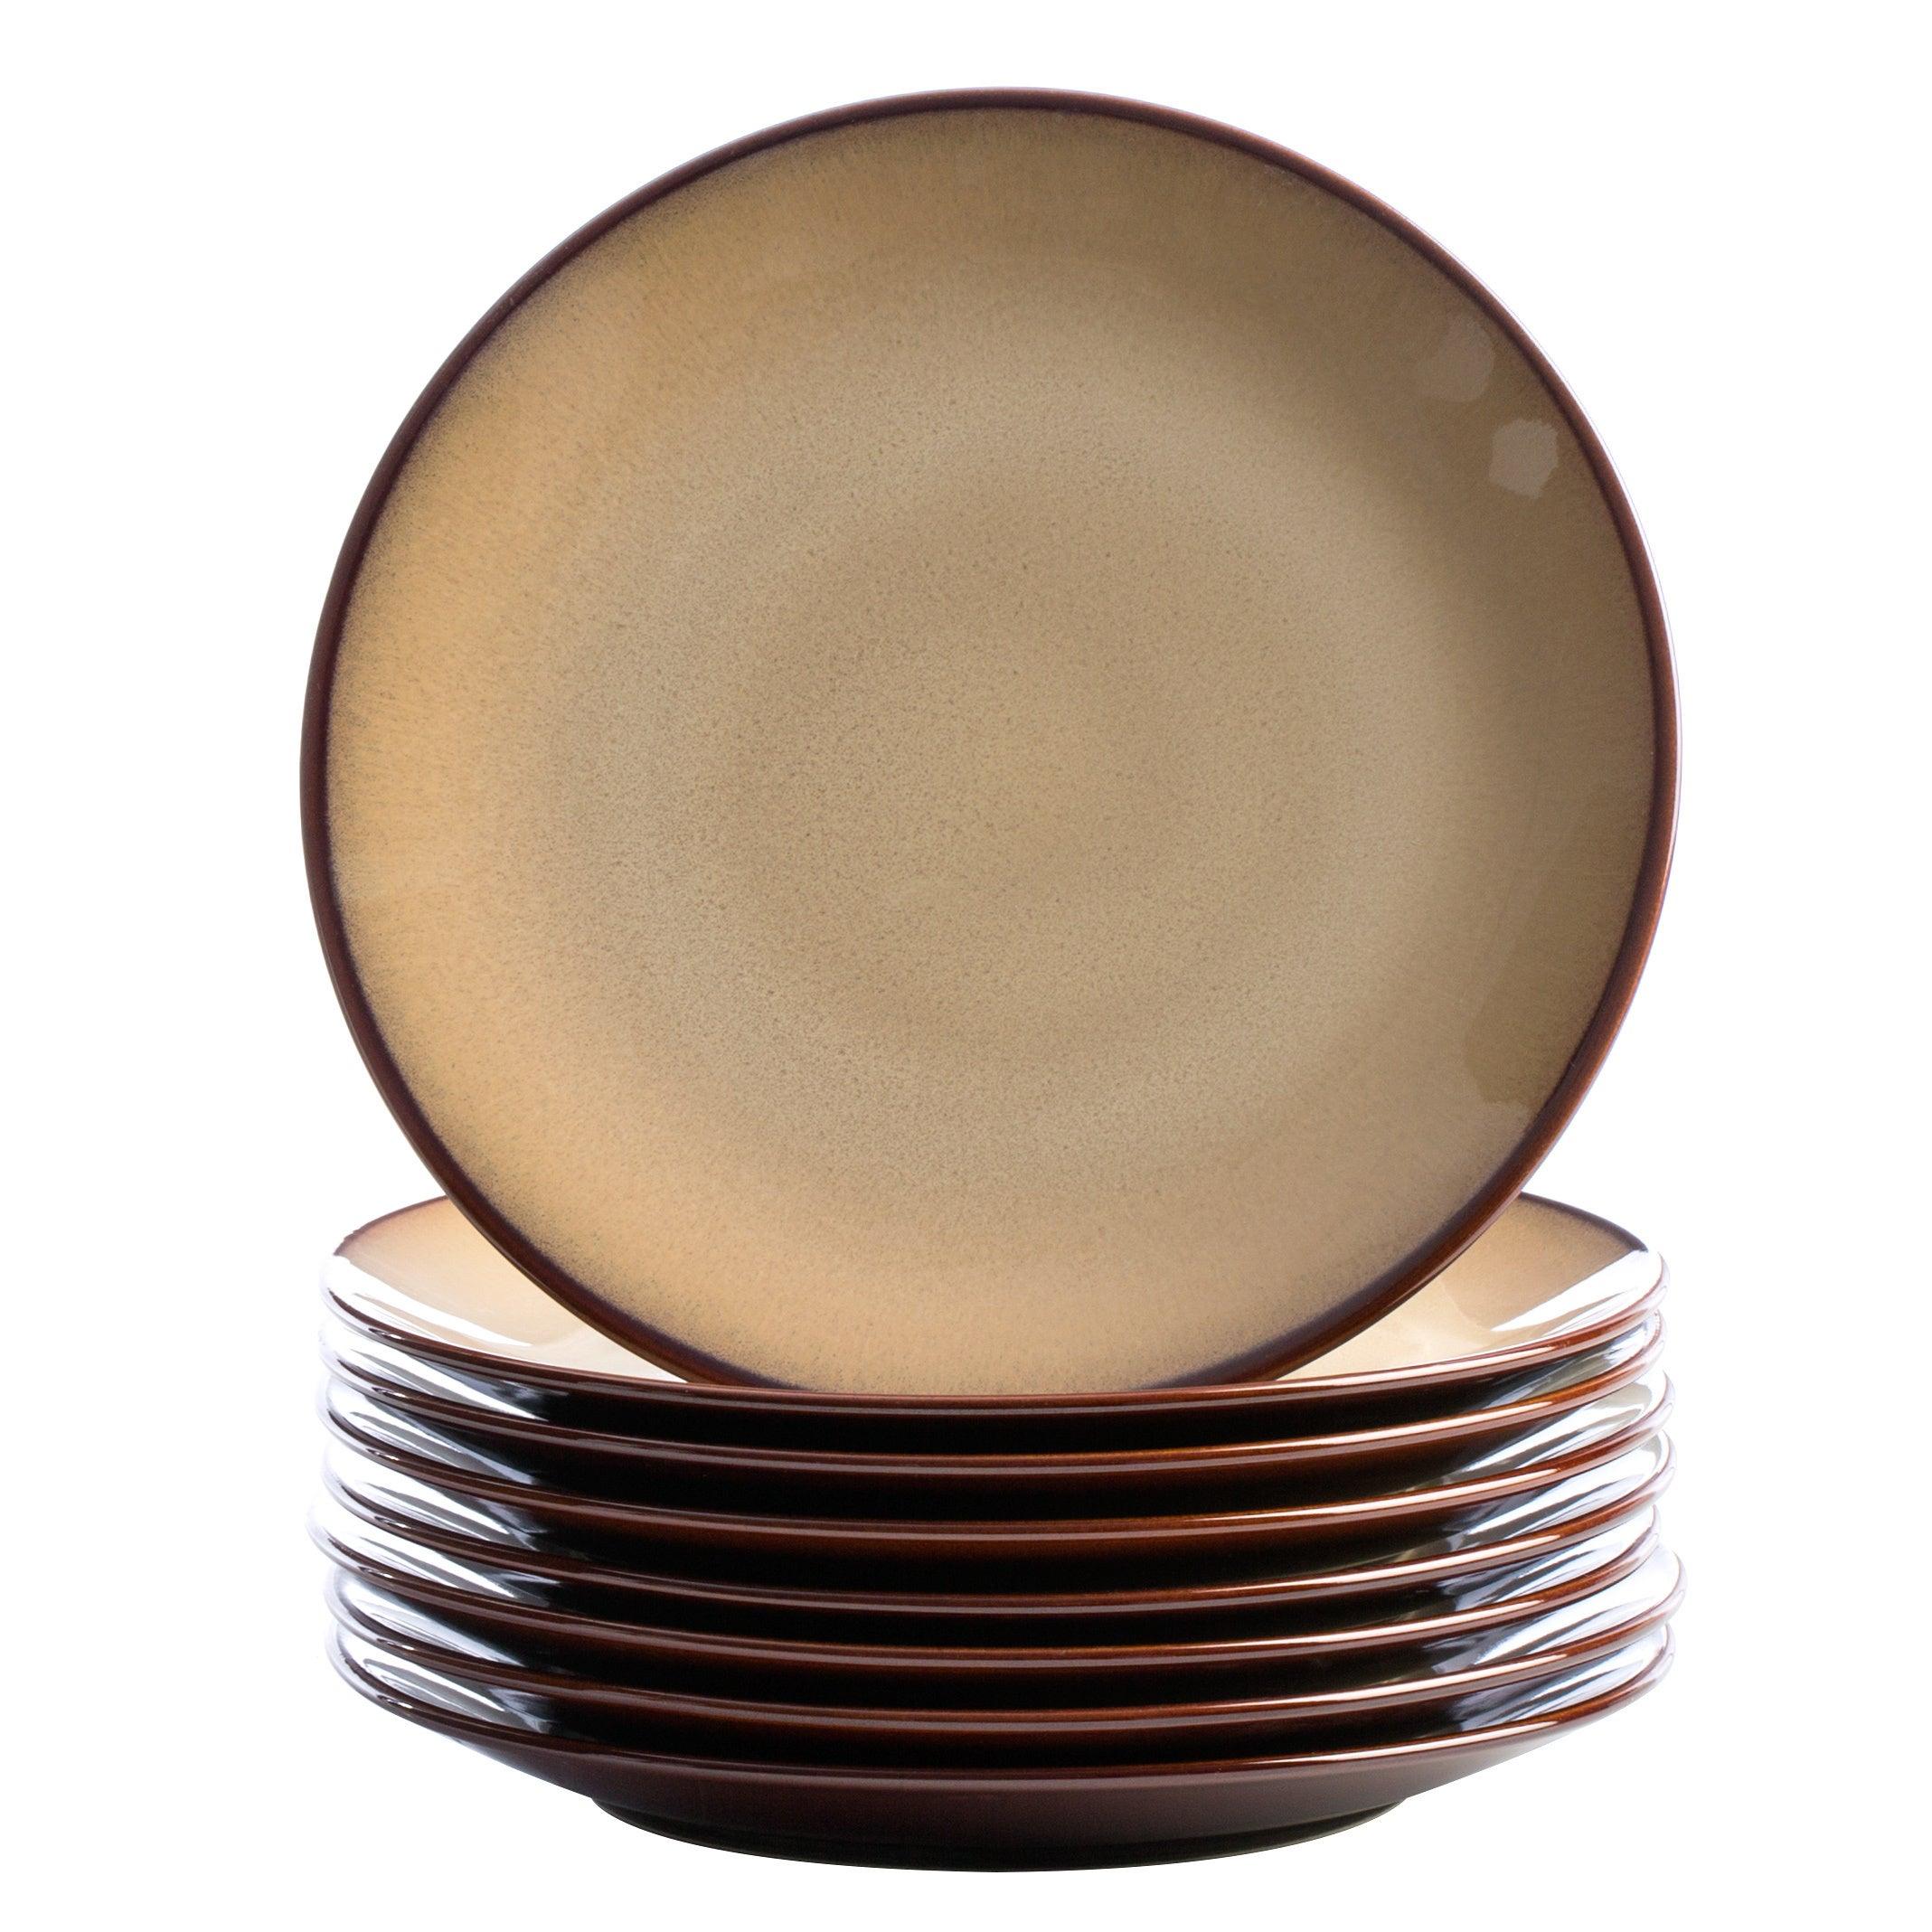 Sango 40-piece Nova Brown Stoneware Dinnerware Set - Free Shipping Today - Overstock - 13005590  sc 1 st  Overstock & Sango 40-piece Nova Brown Stoneware Dinnerware Set - Free Shipping ...